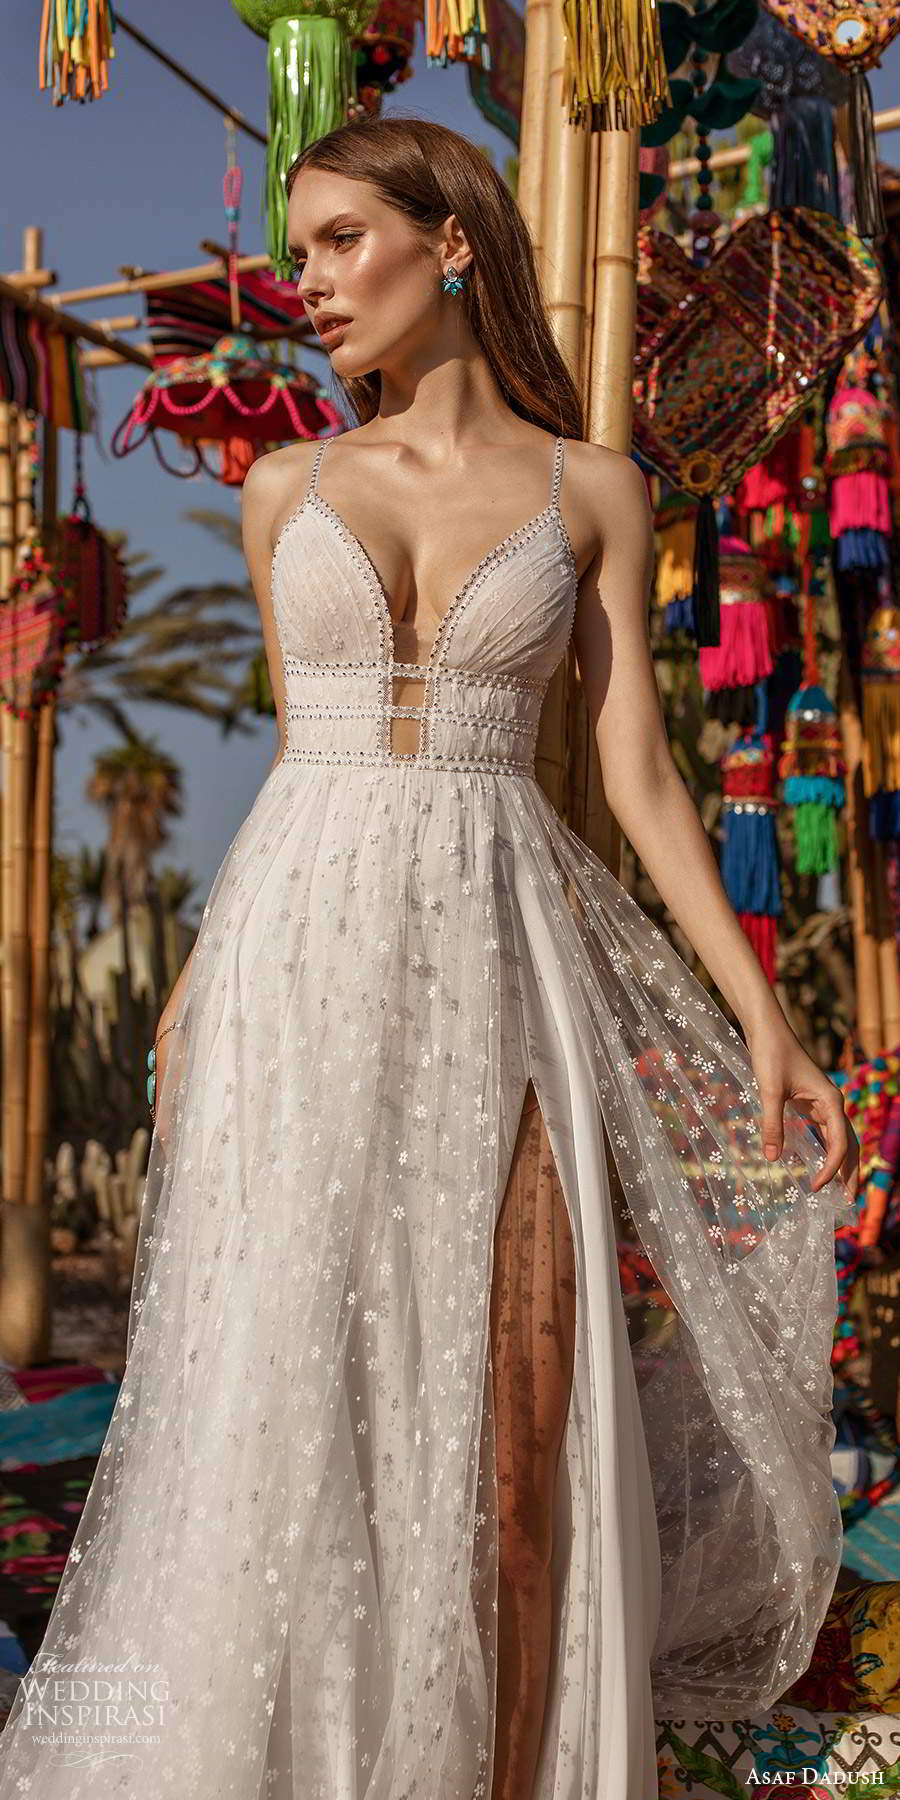 asaf dadush 2020 bridal sleeveless thin beaded straps plunging v neckline fully embellished a line ball gown wedding dress slit skirt open back (7) zv